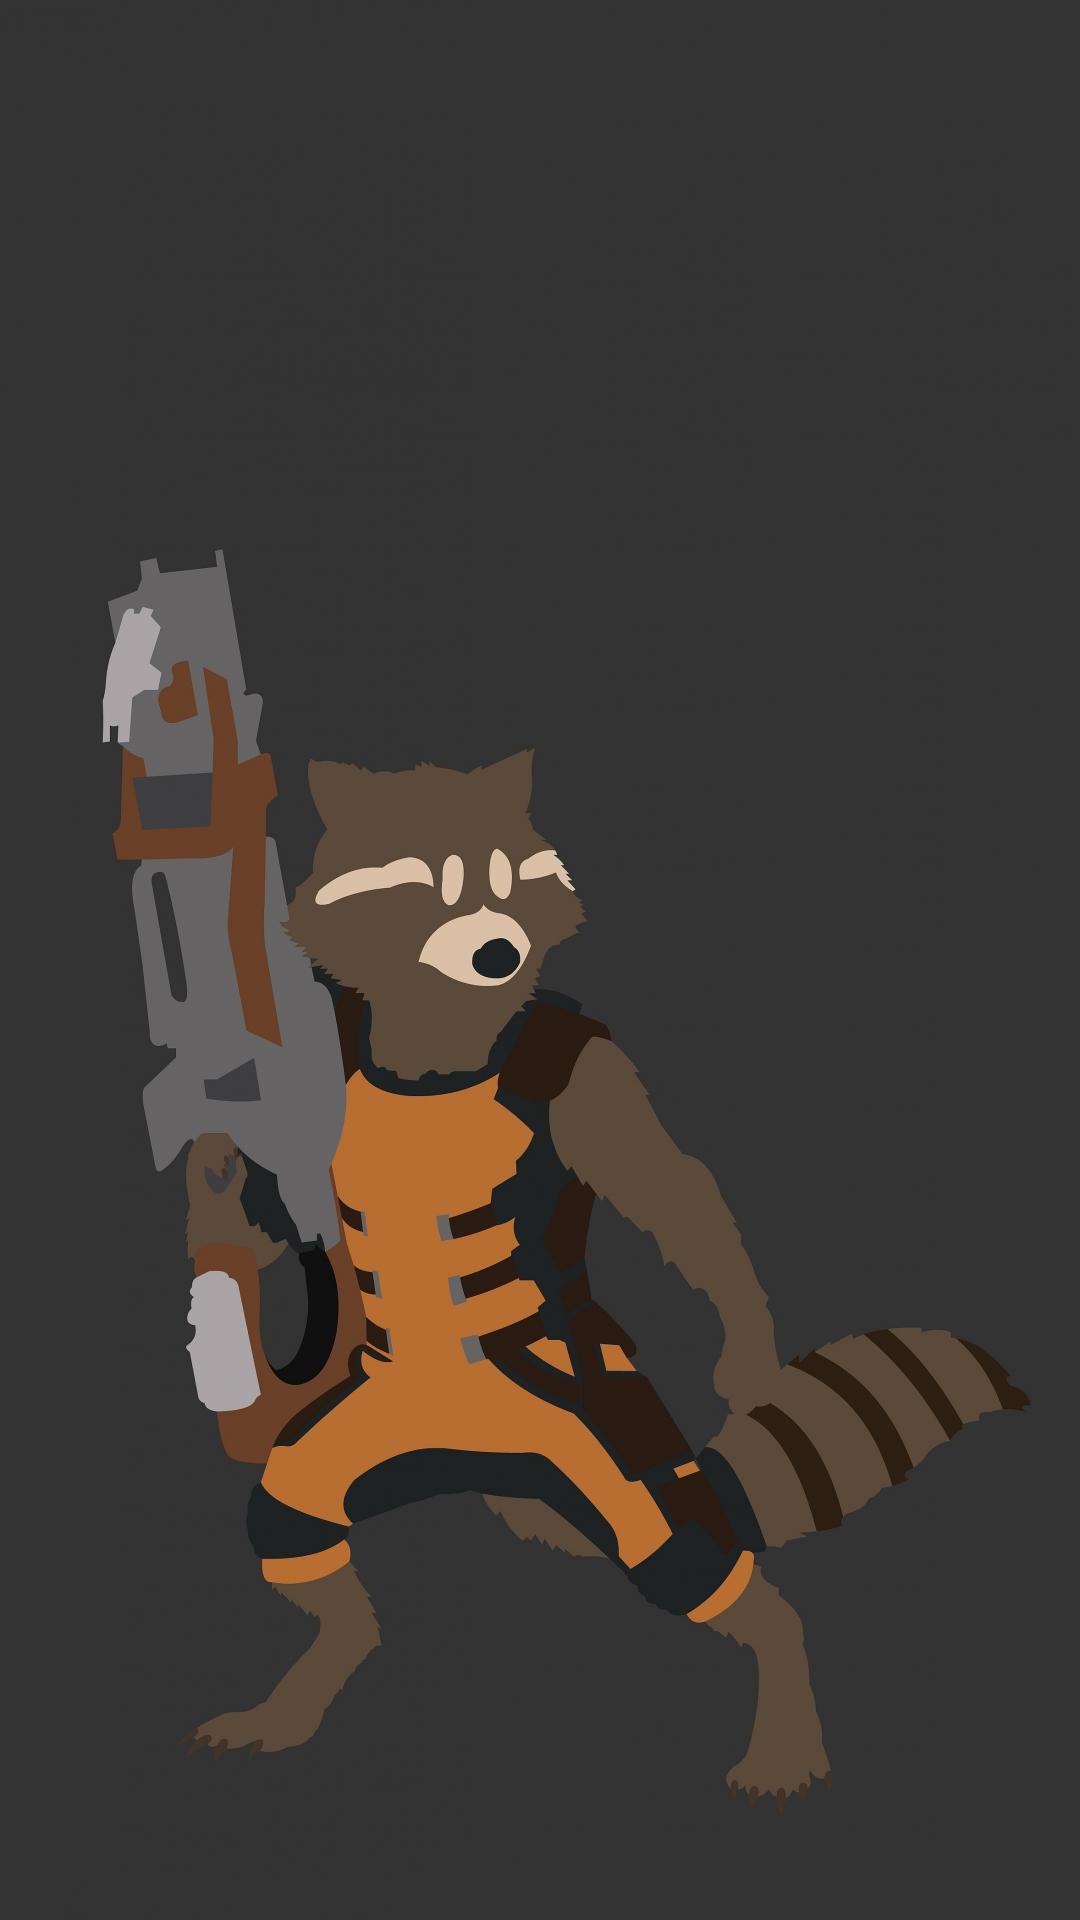 Comics Rocket Raccoon 1080x1920 Mobile Wallpaper